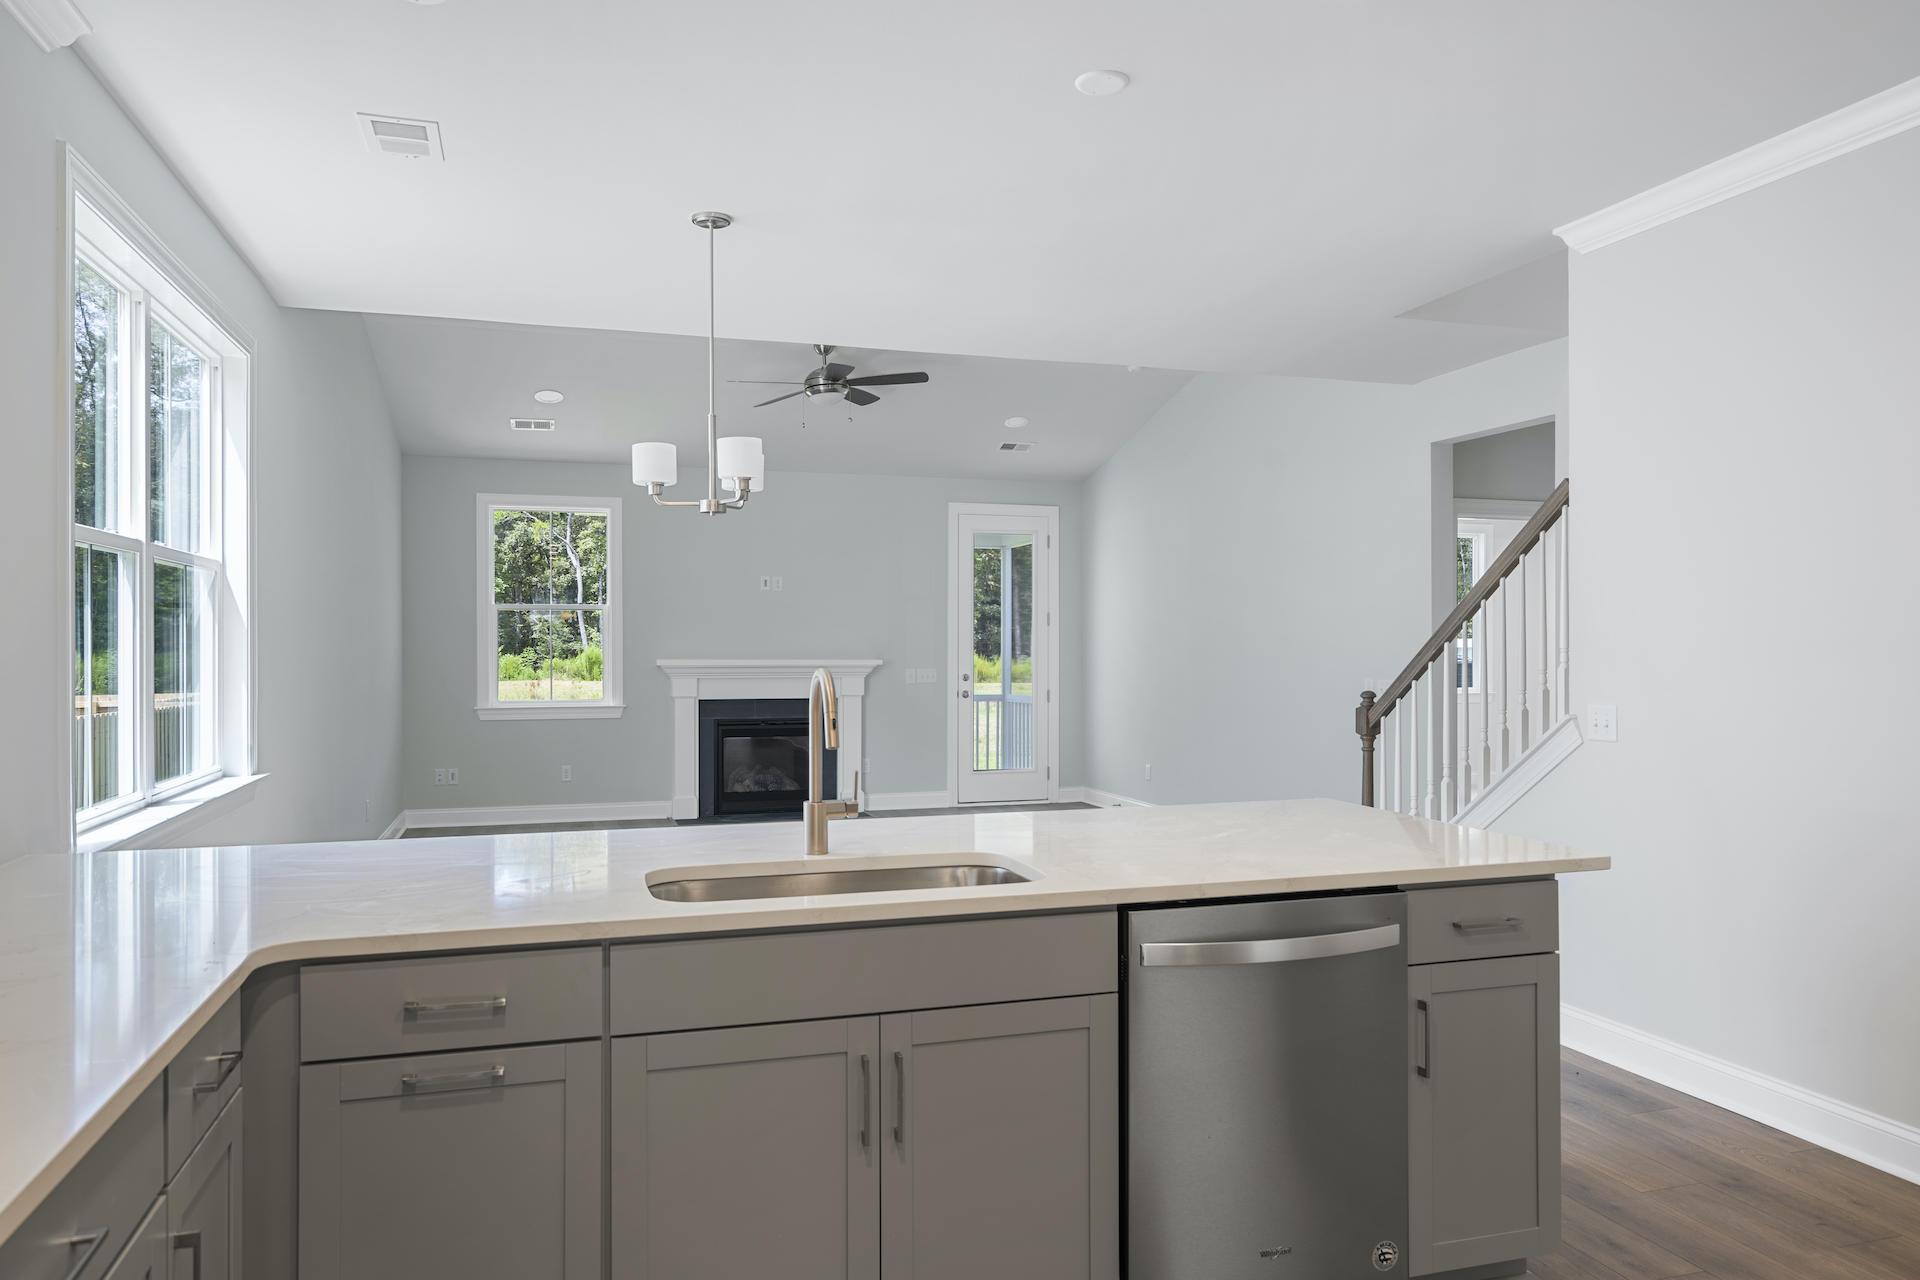 Drayton Oaks Homes For Sale - 105 Plowden Mill, Summerville, SC - 22